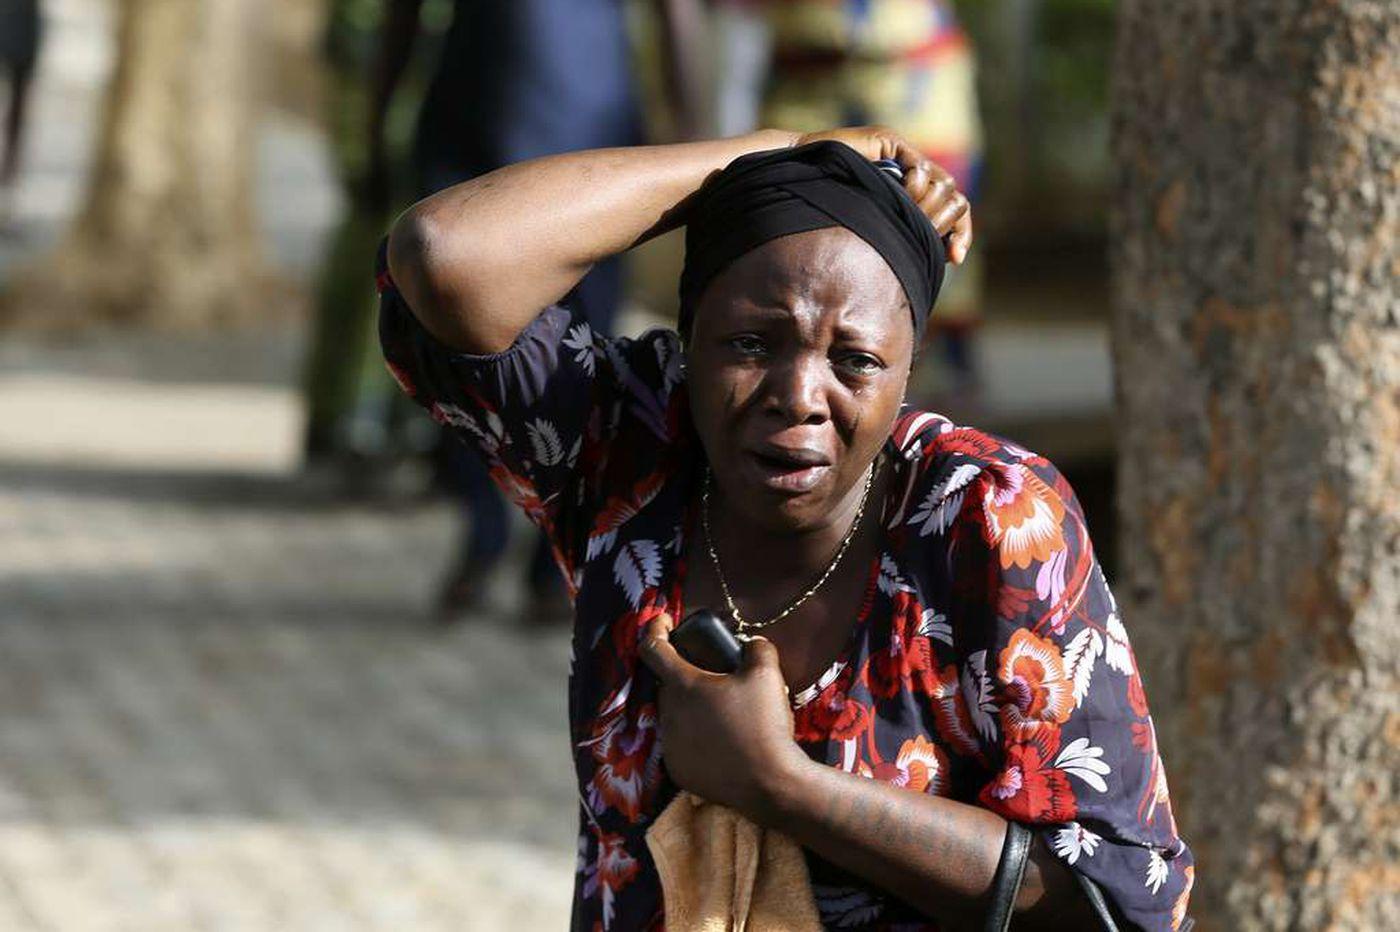 Boko Haram behind deadly blast, Nigerian president says